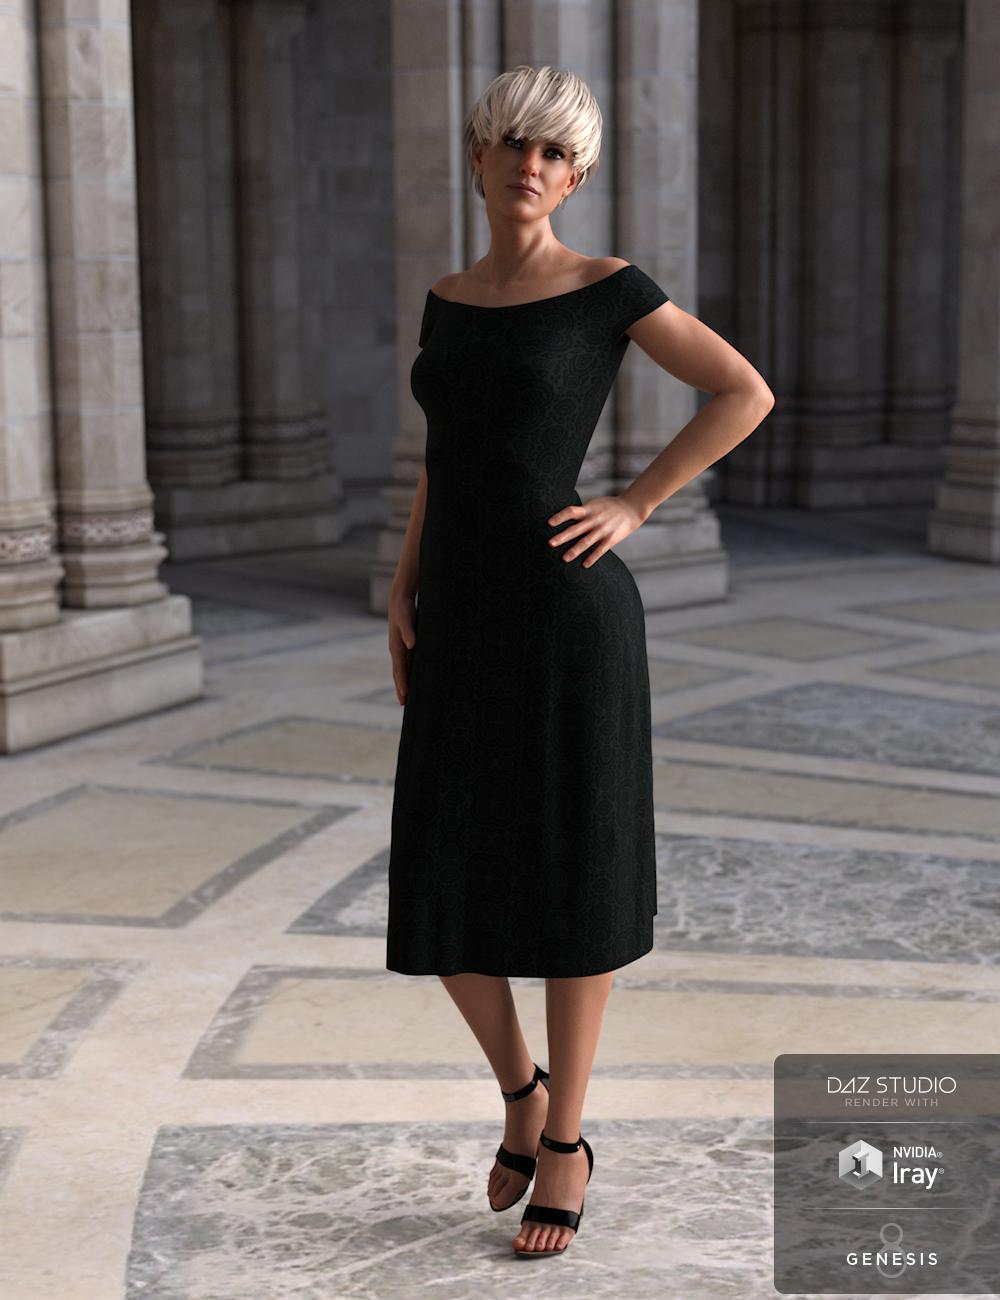 dForce Summer Dress Venice for Genesis 8 Female(s) by: Aquarius, 3D Models by Daz 3D